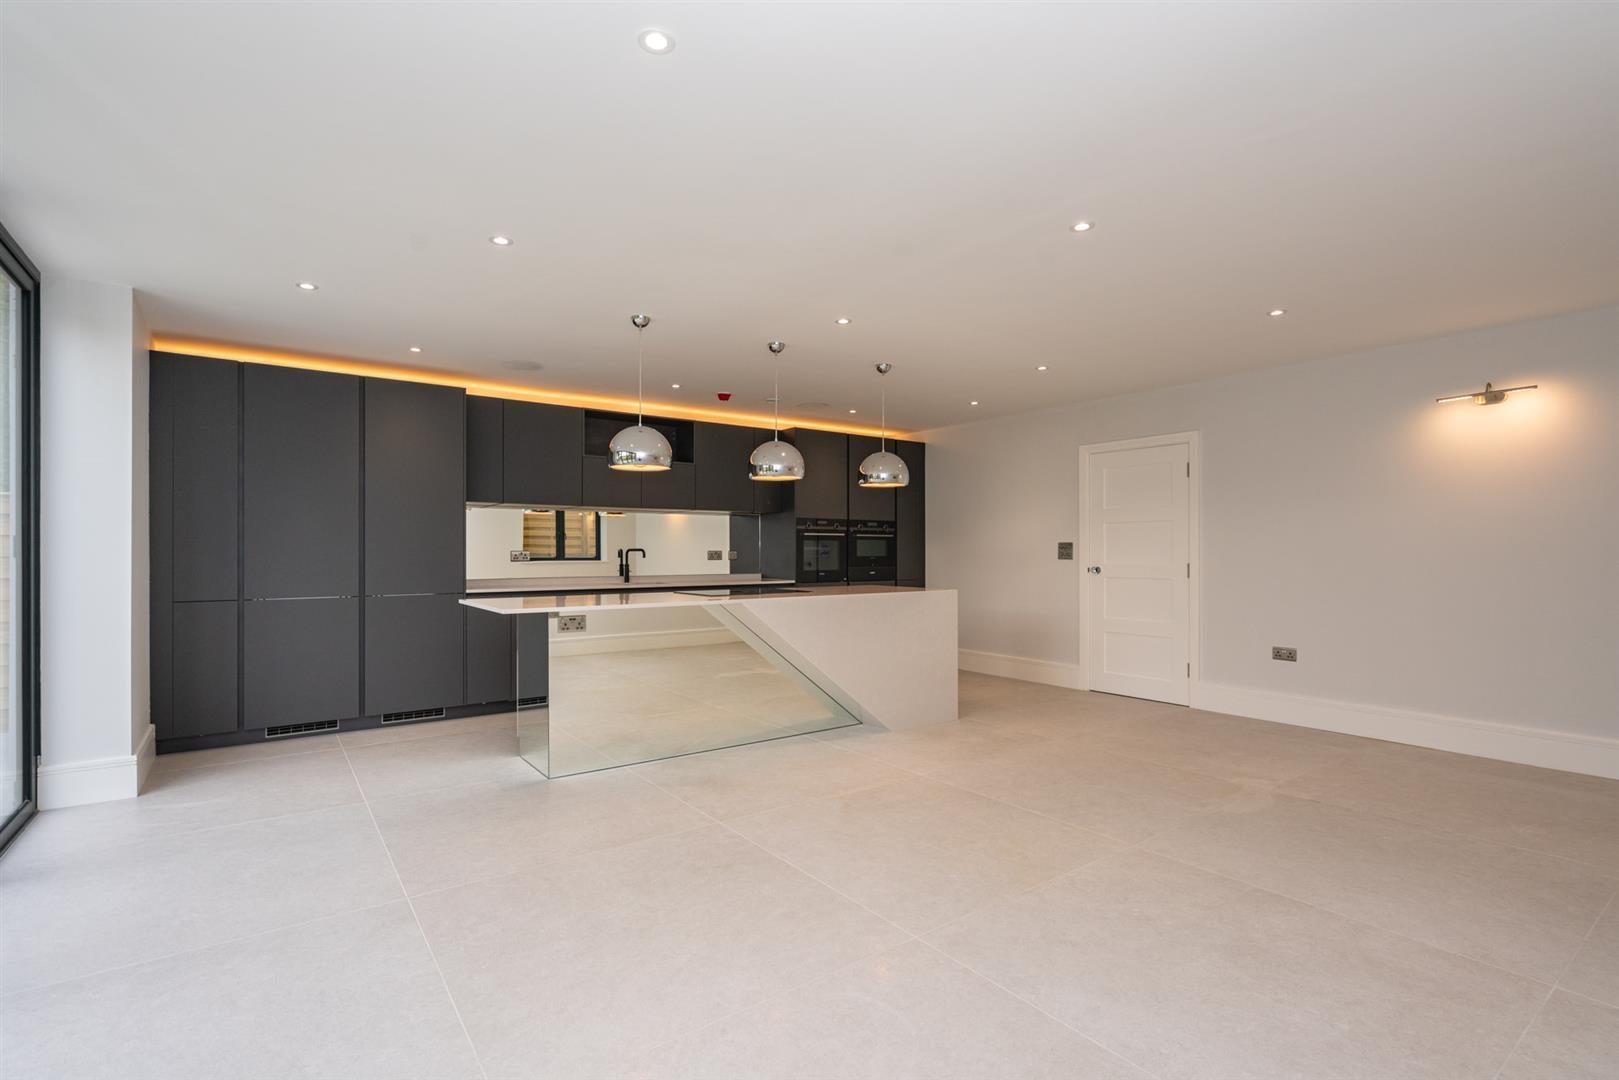 Hillcrest-3150 - kitchen diner 1.jpg